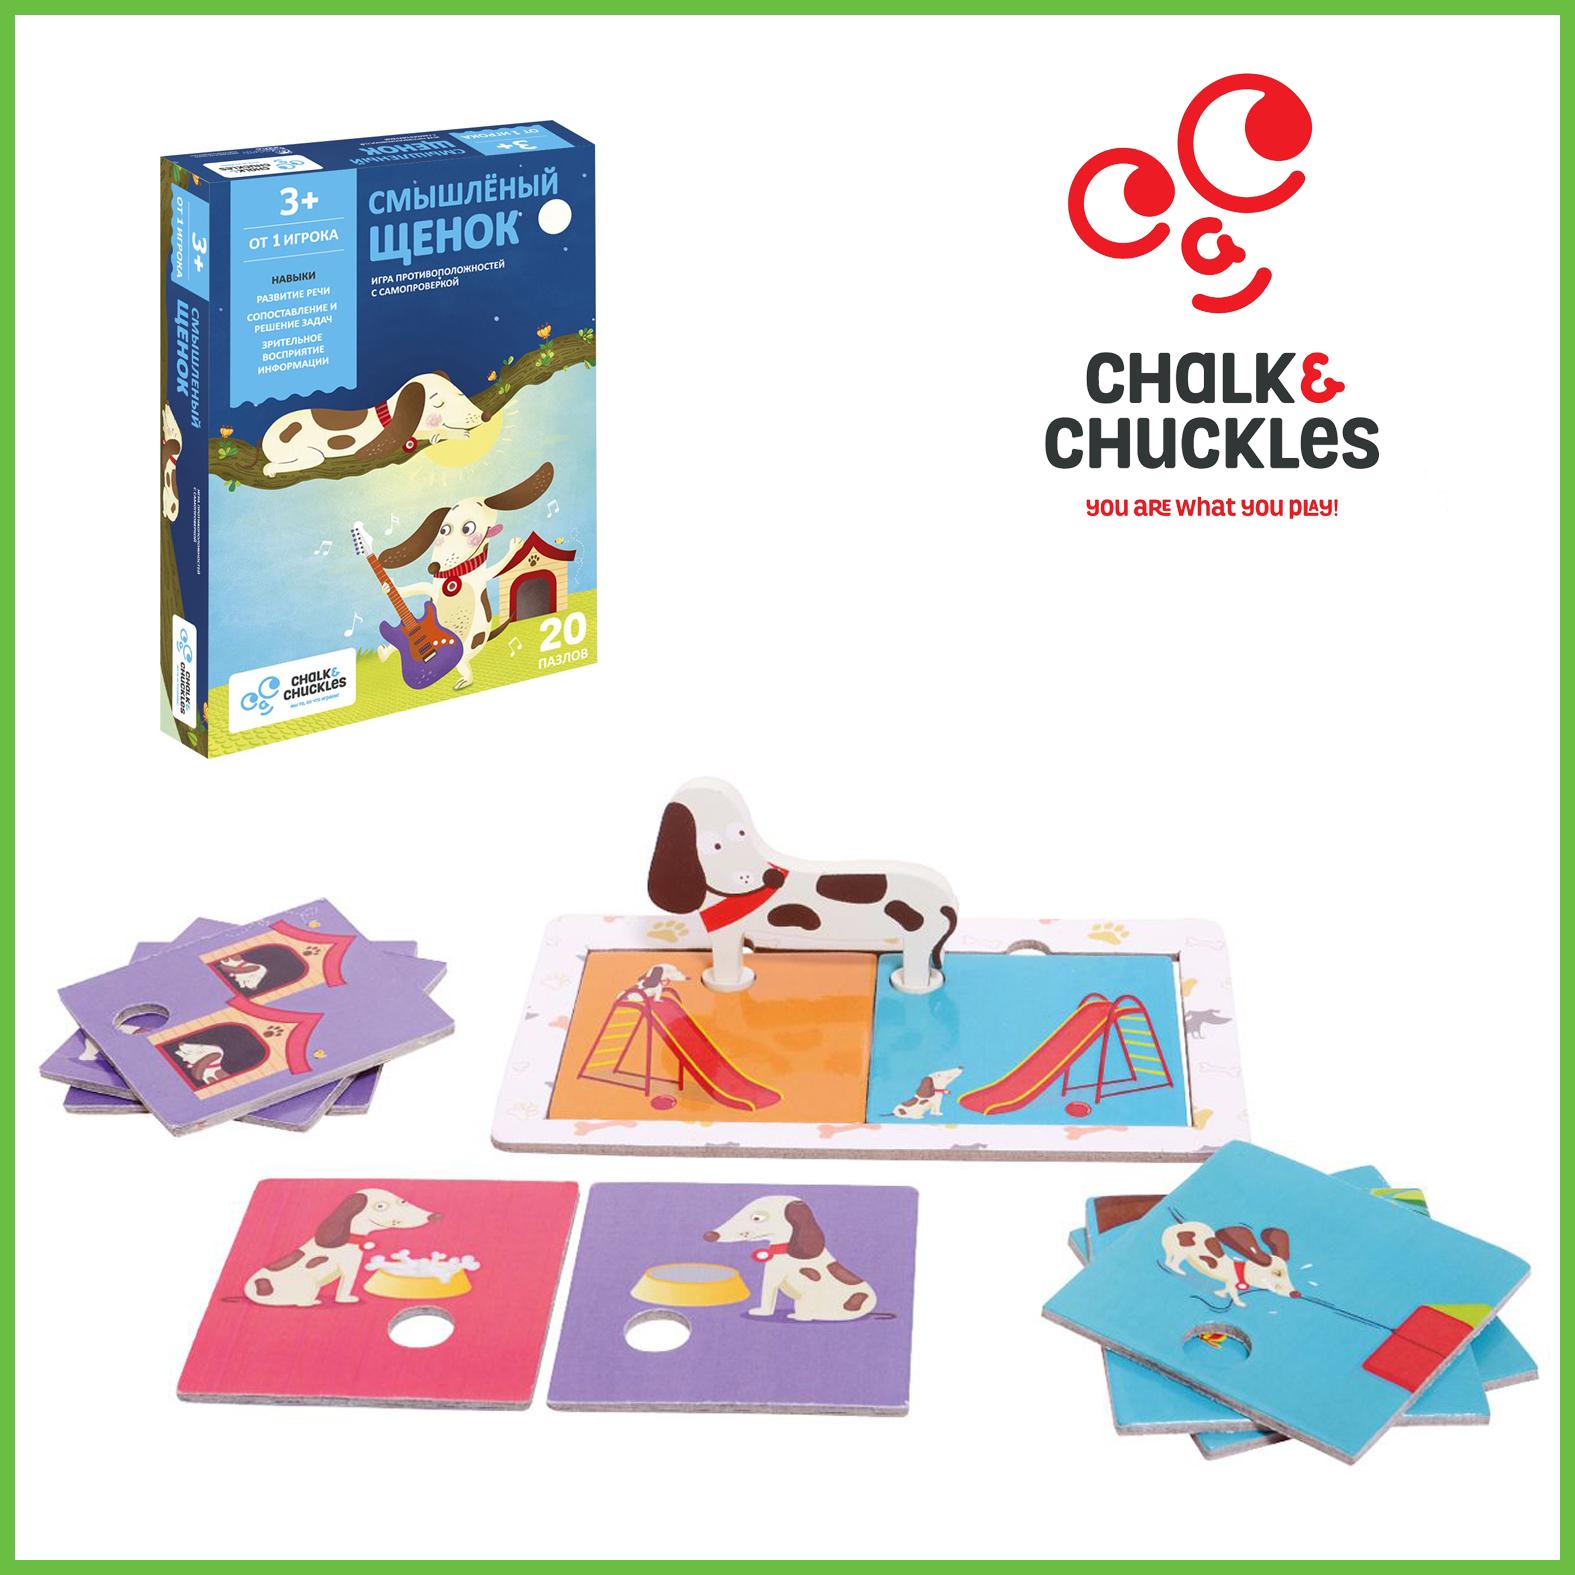 Chalk&Chuckles